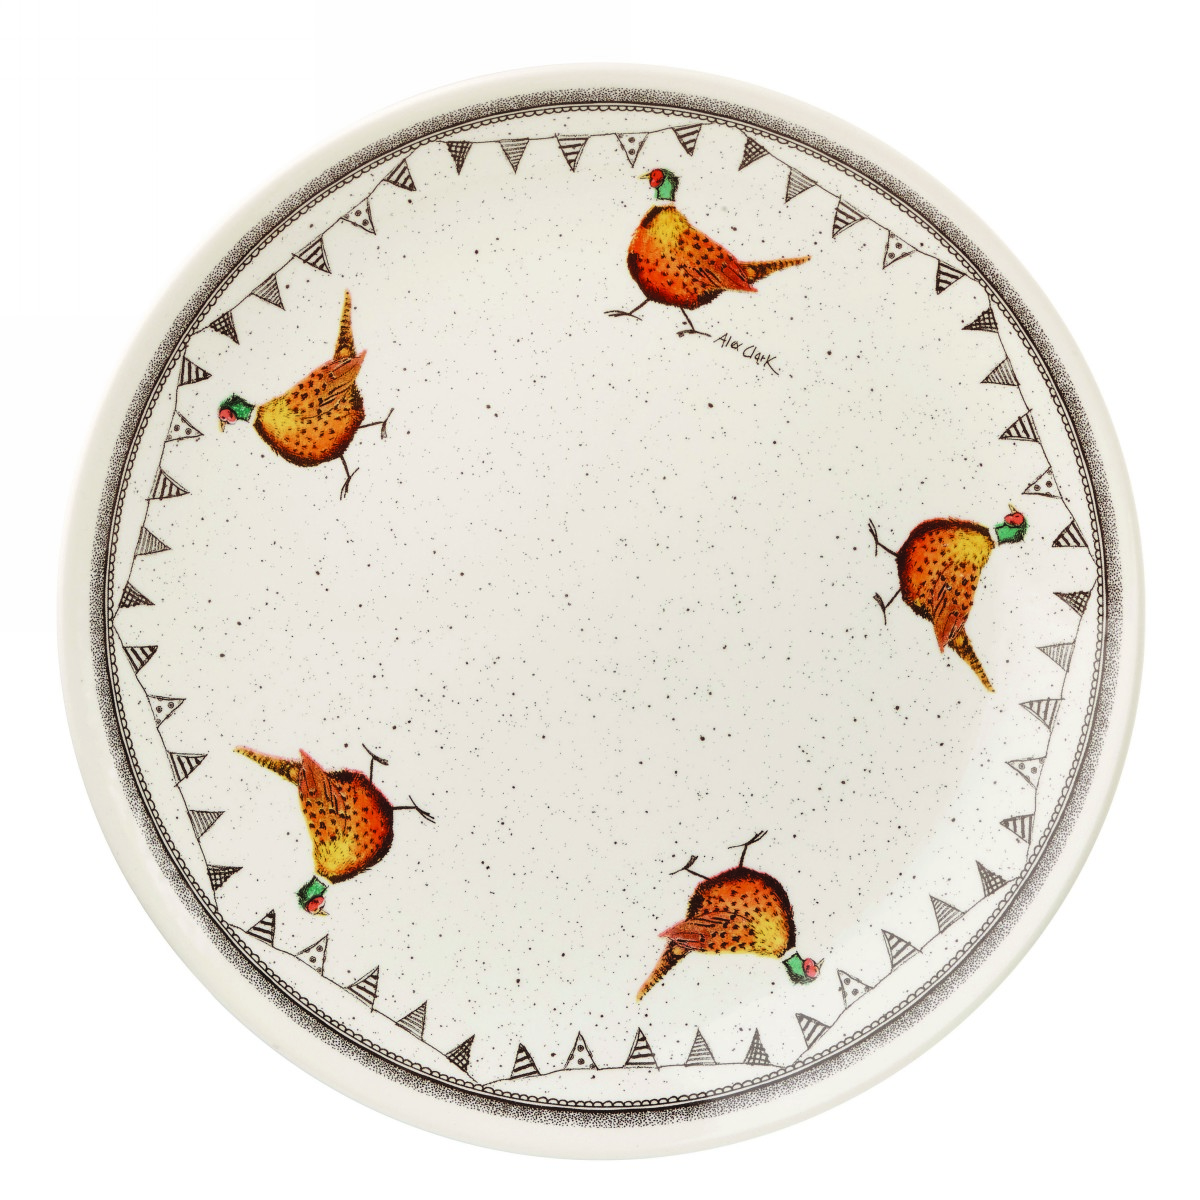 Тарелка столовая Churchill 26 см Живая природа от Алекс Кларк